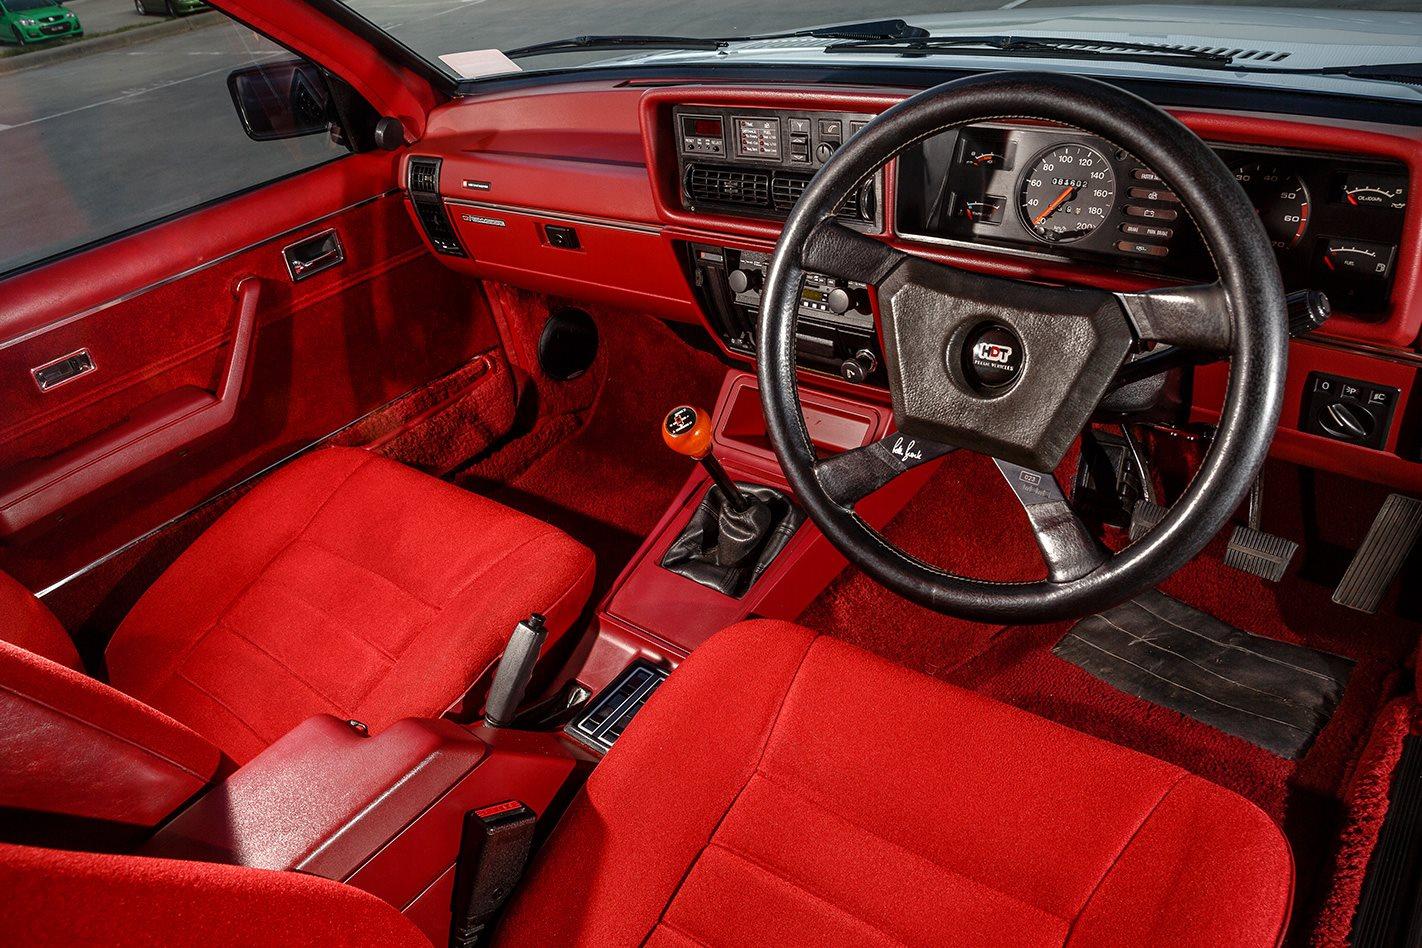 Holden-VC-Brock-Commodore-interior.jpg